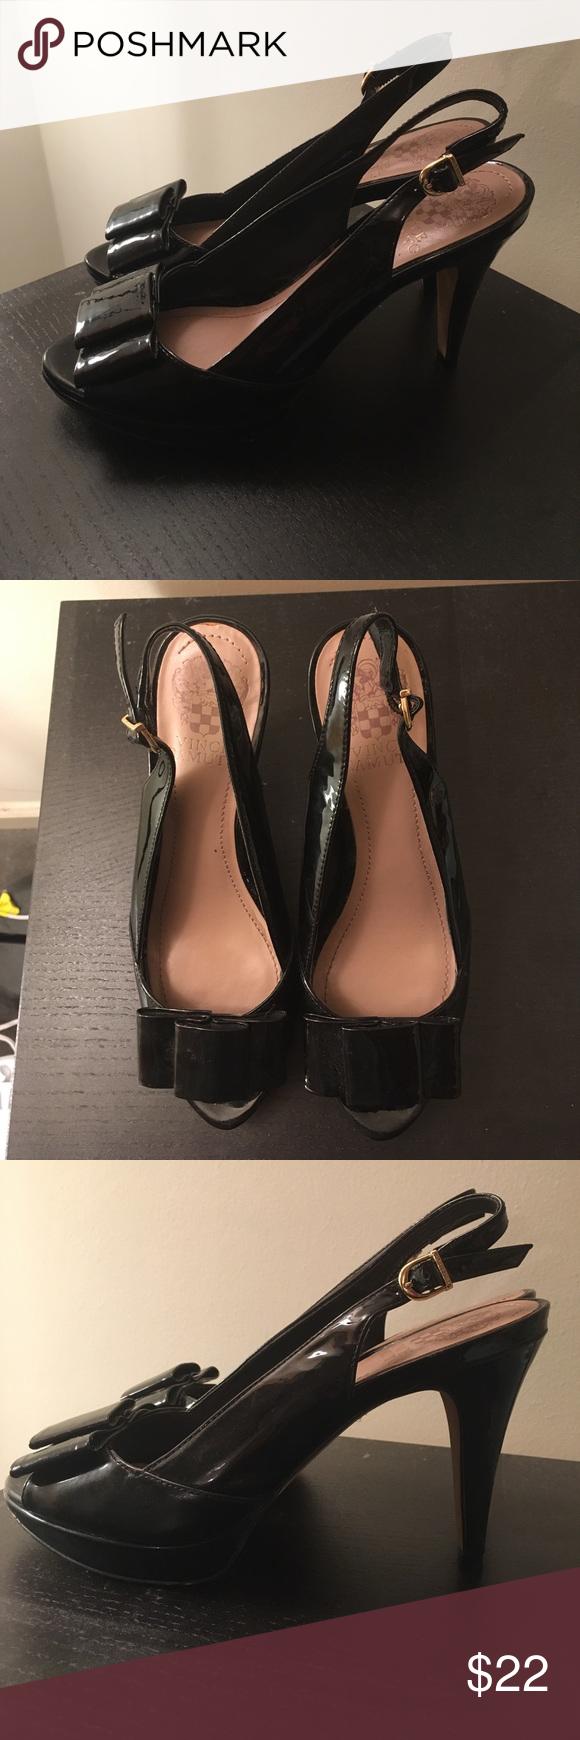 Vince Camuto peep toe bow heels Barely worn black leather peep toe & bow detail sling back heels! Vince Camuto Shoes Heels